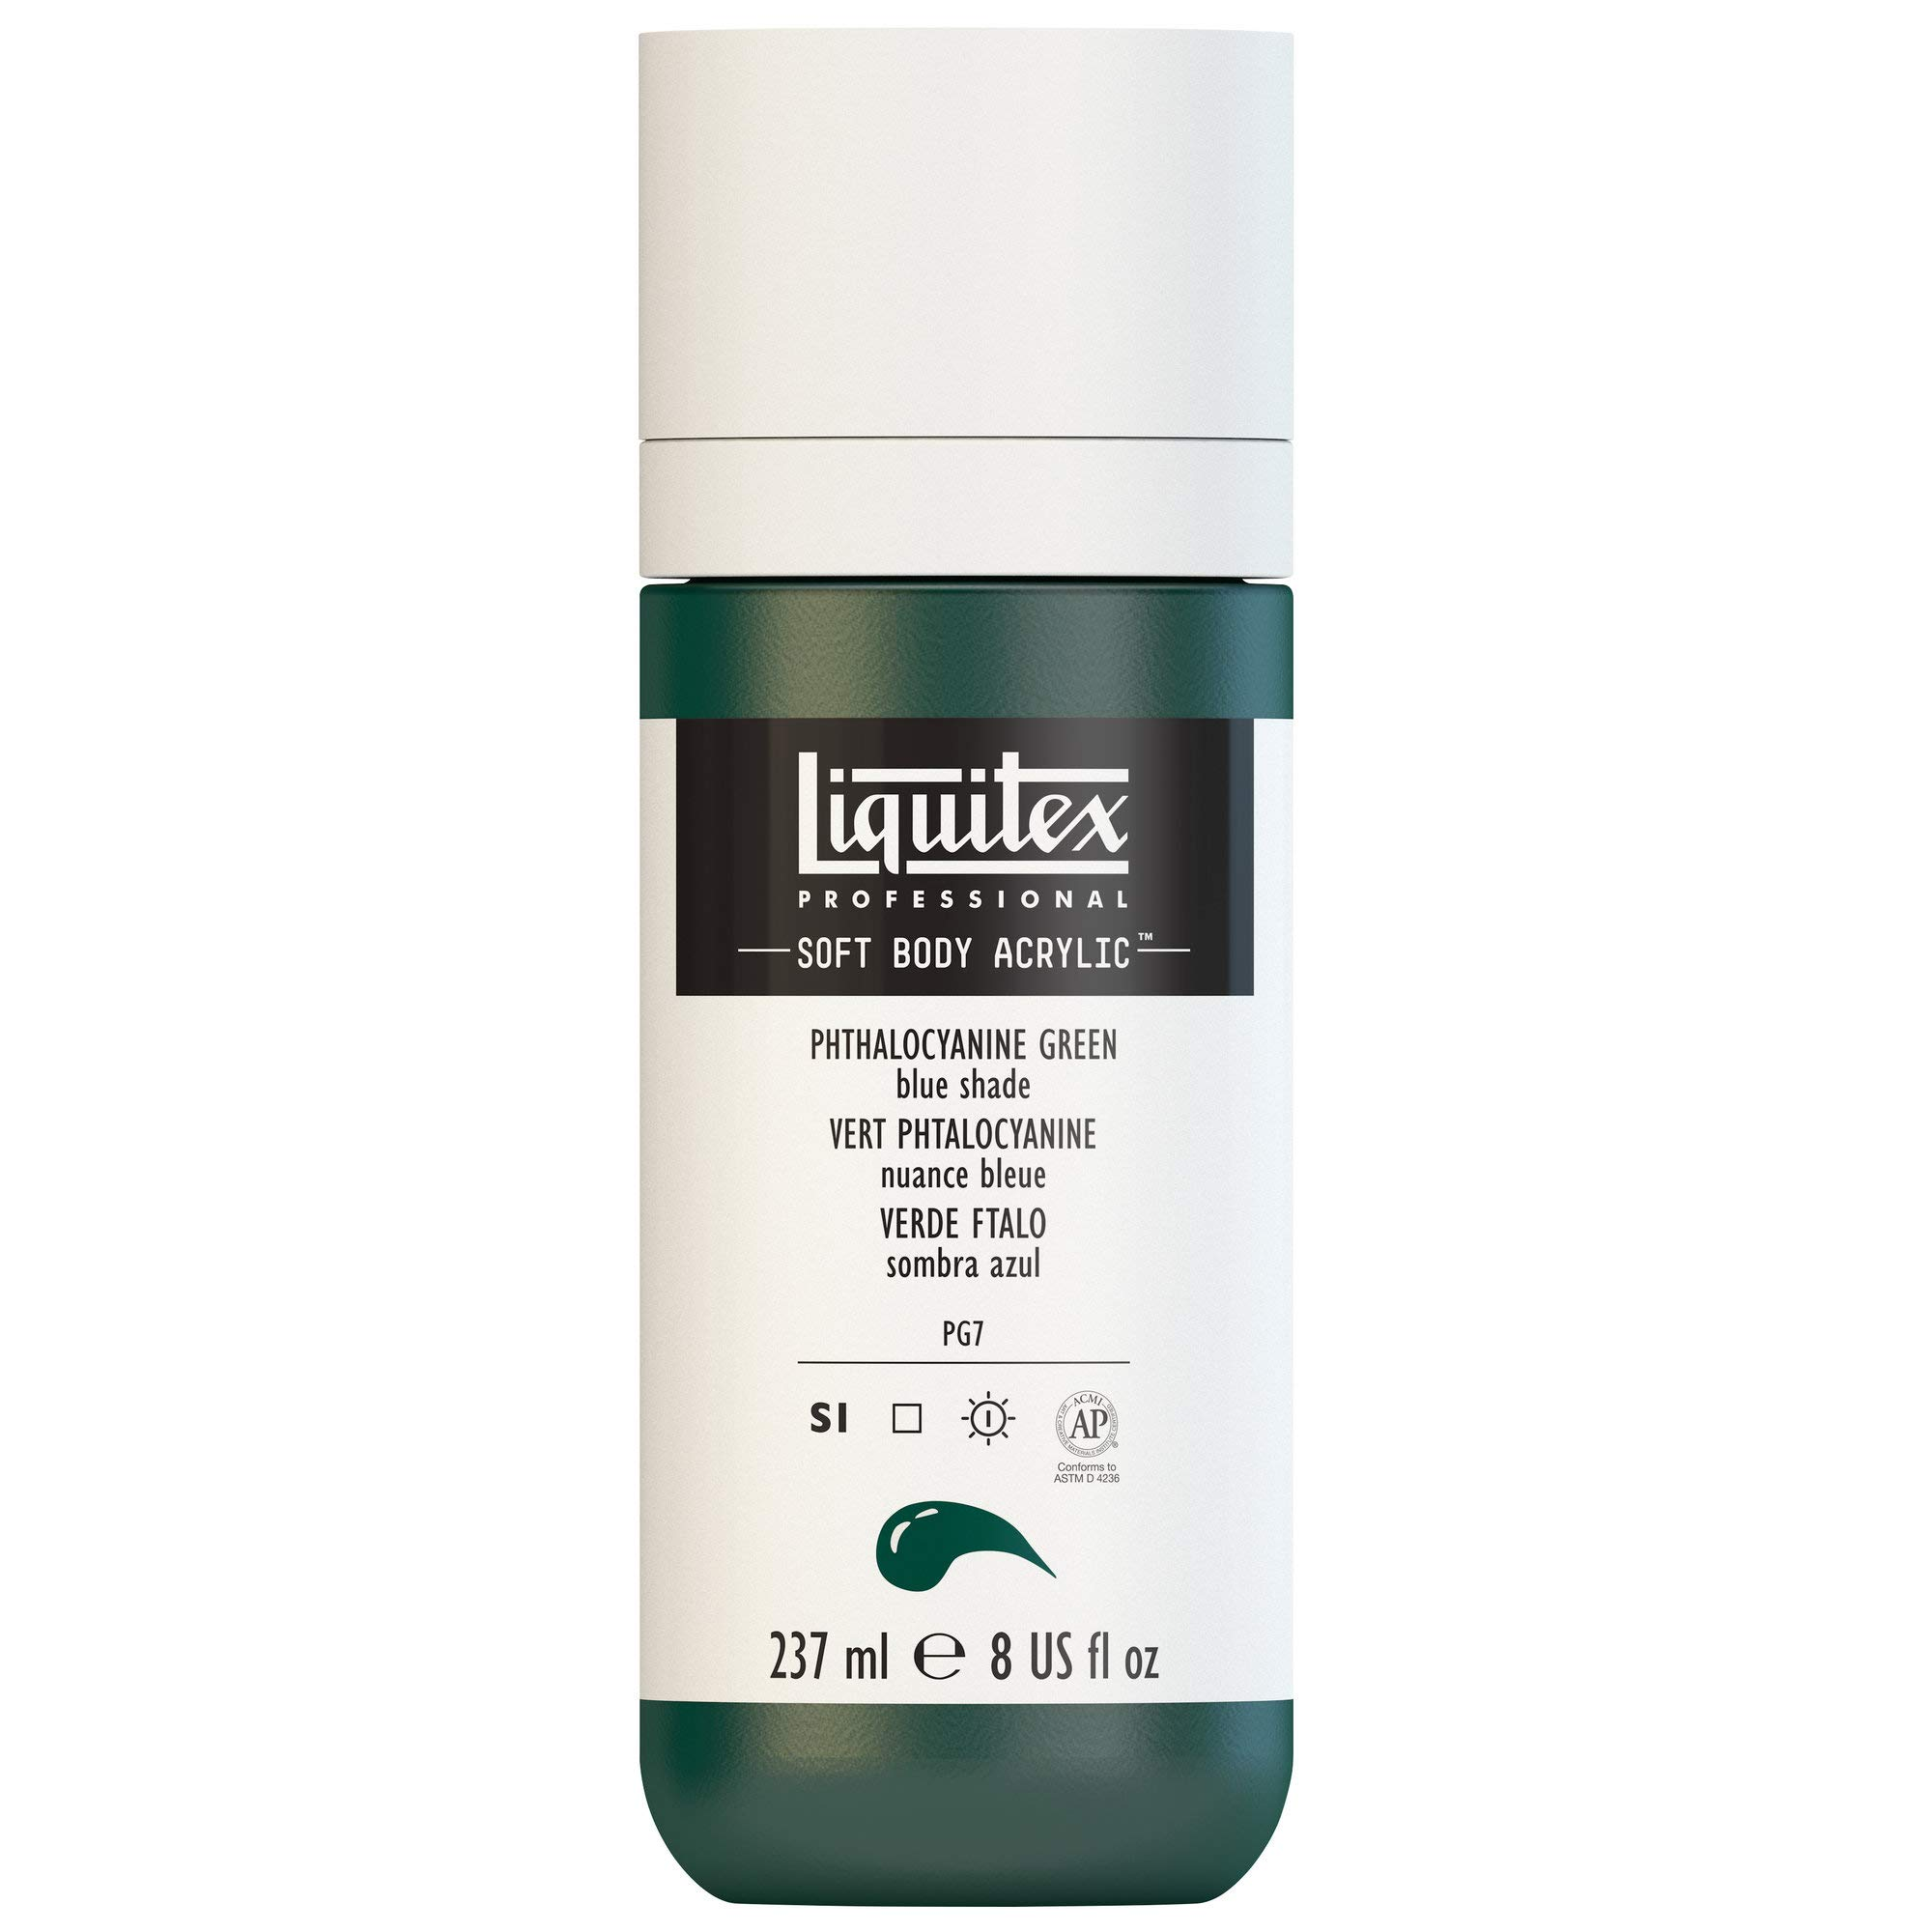 Liquitex Professional Soft Body Acrylic Paint 8-oz bottle, Phthalocyanine Green (Blue Shade)